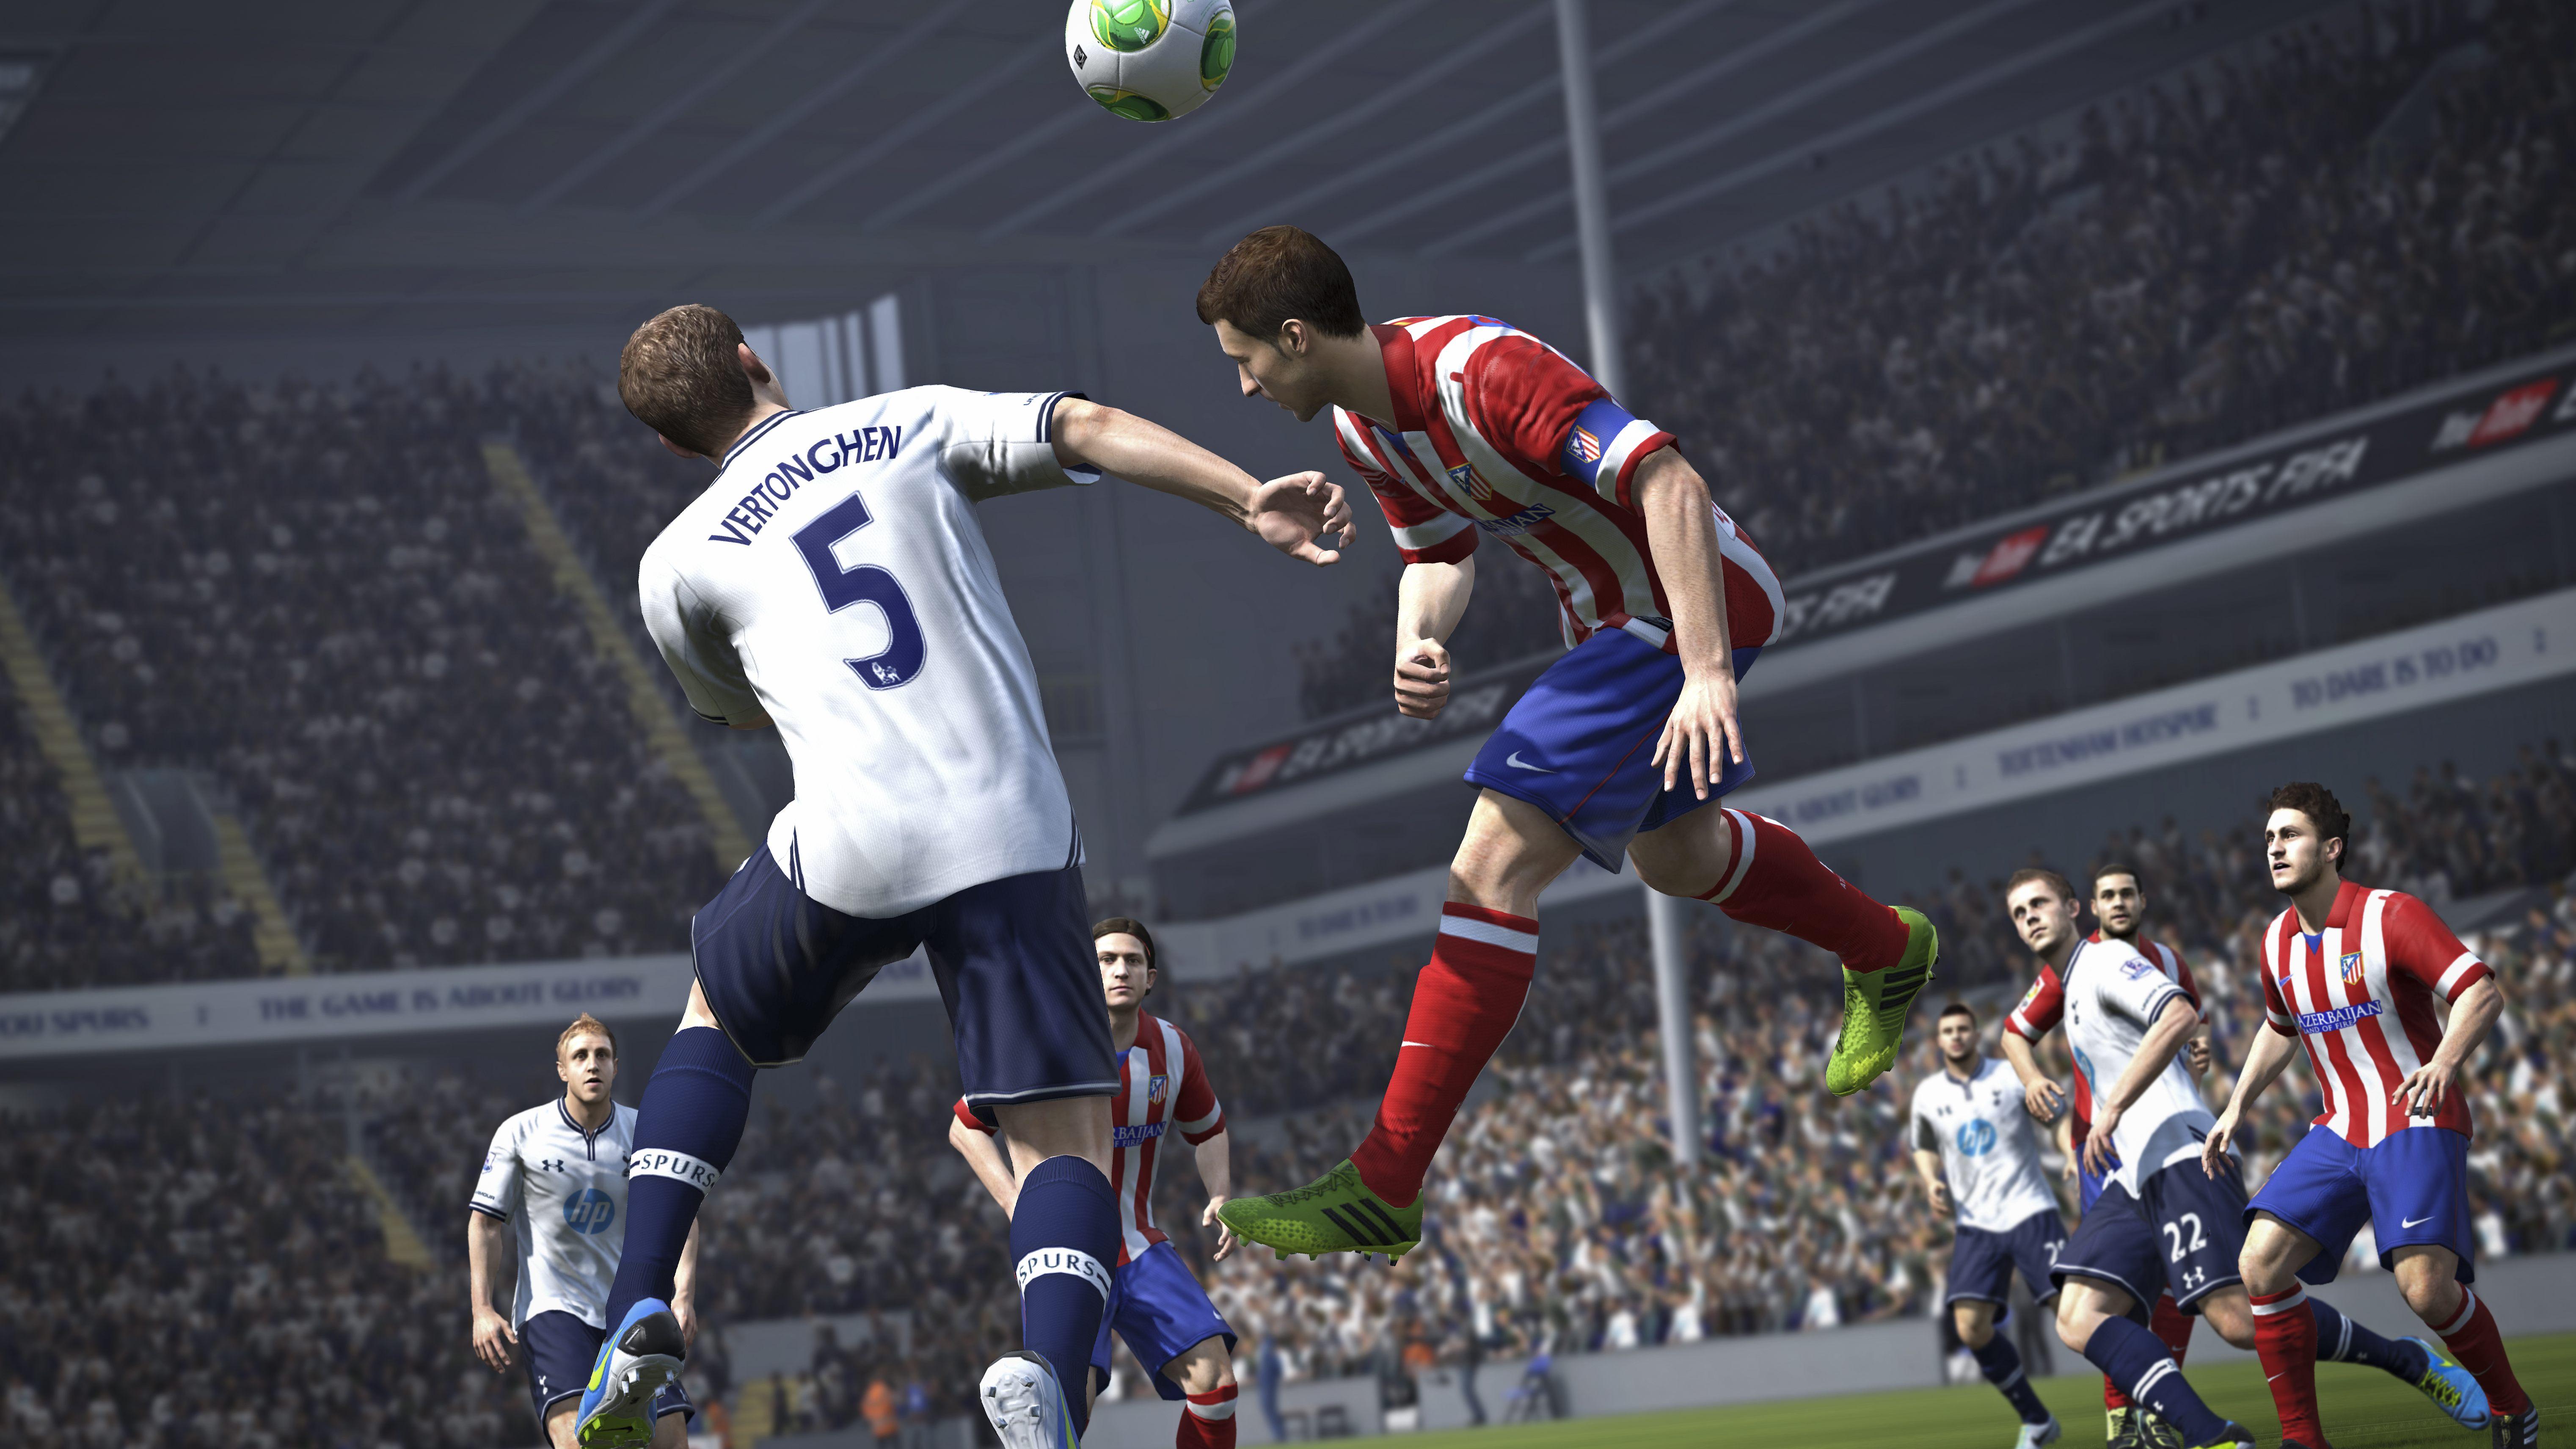 Obrázky z inFamous, NFS: Rivals, FIFA 14, Alien Rage 86409